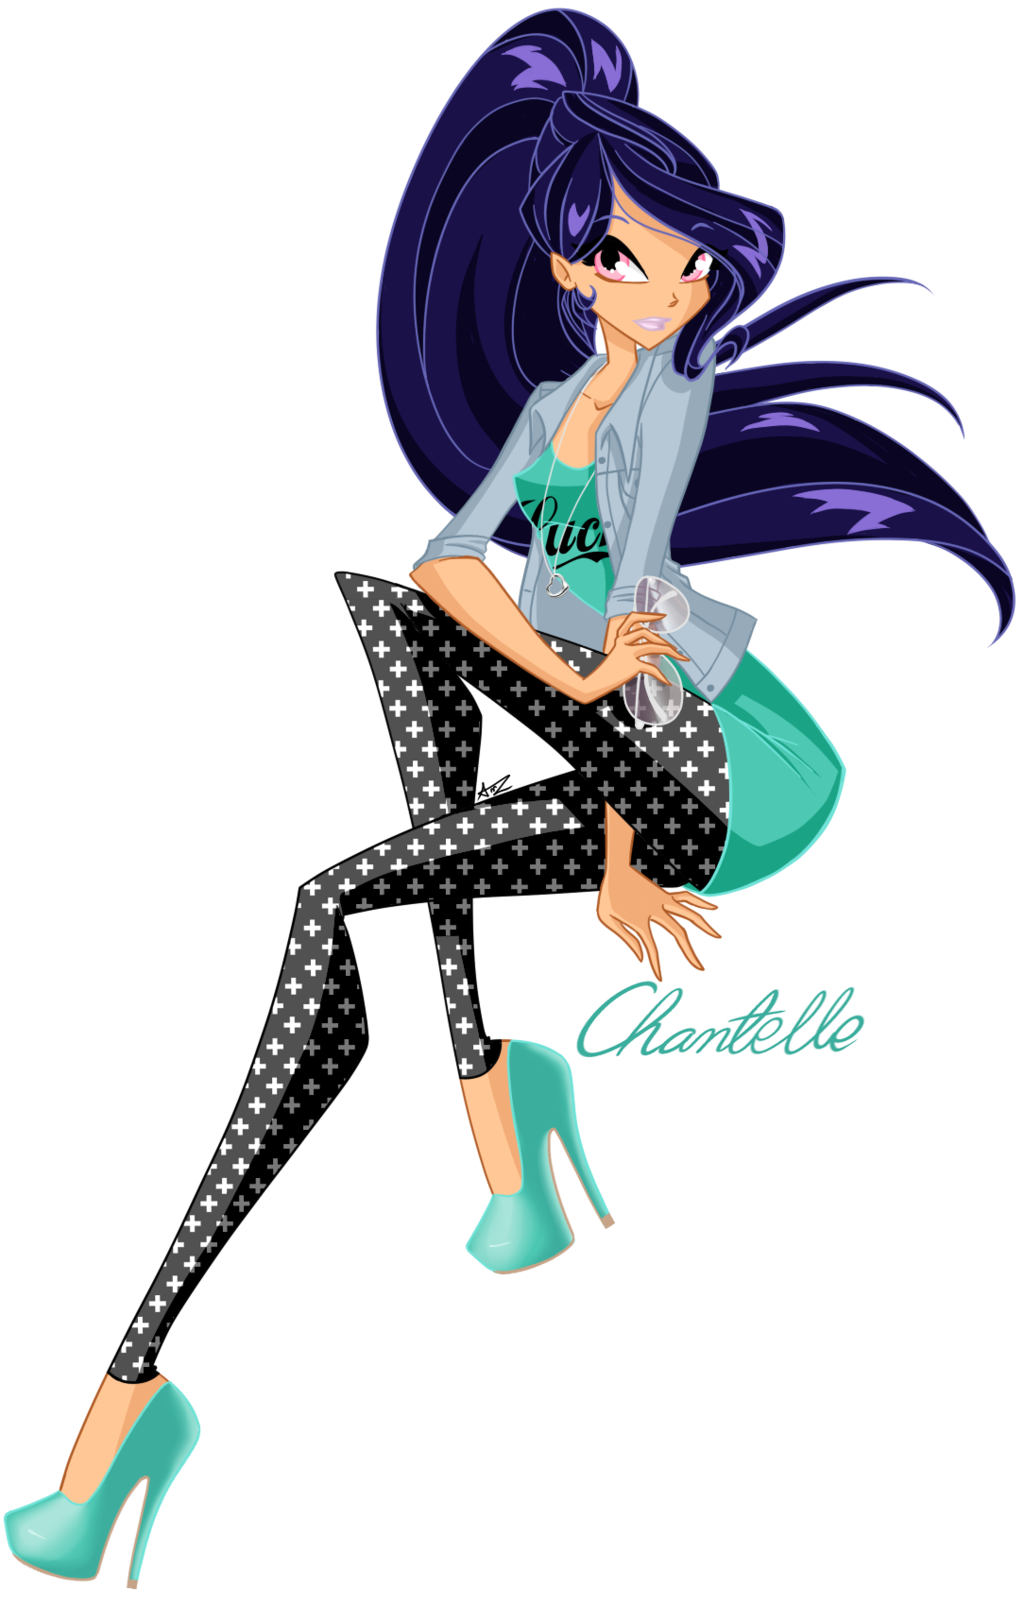 PC: AshaYay - Chantelle by Ameryliz.deviantart.com on @deviantART